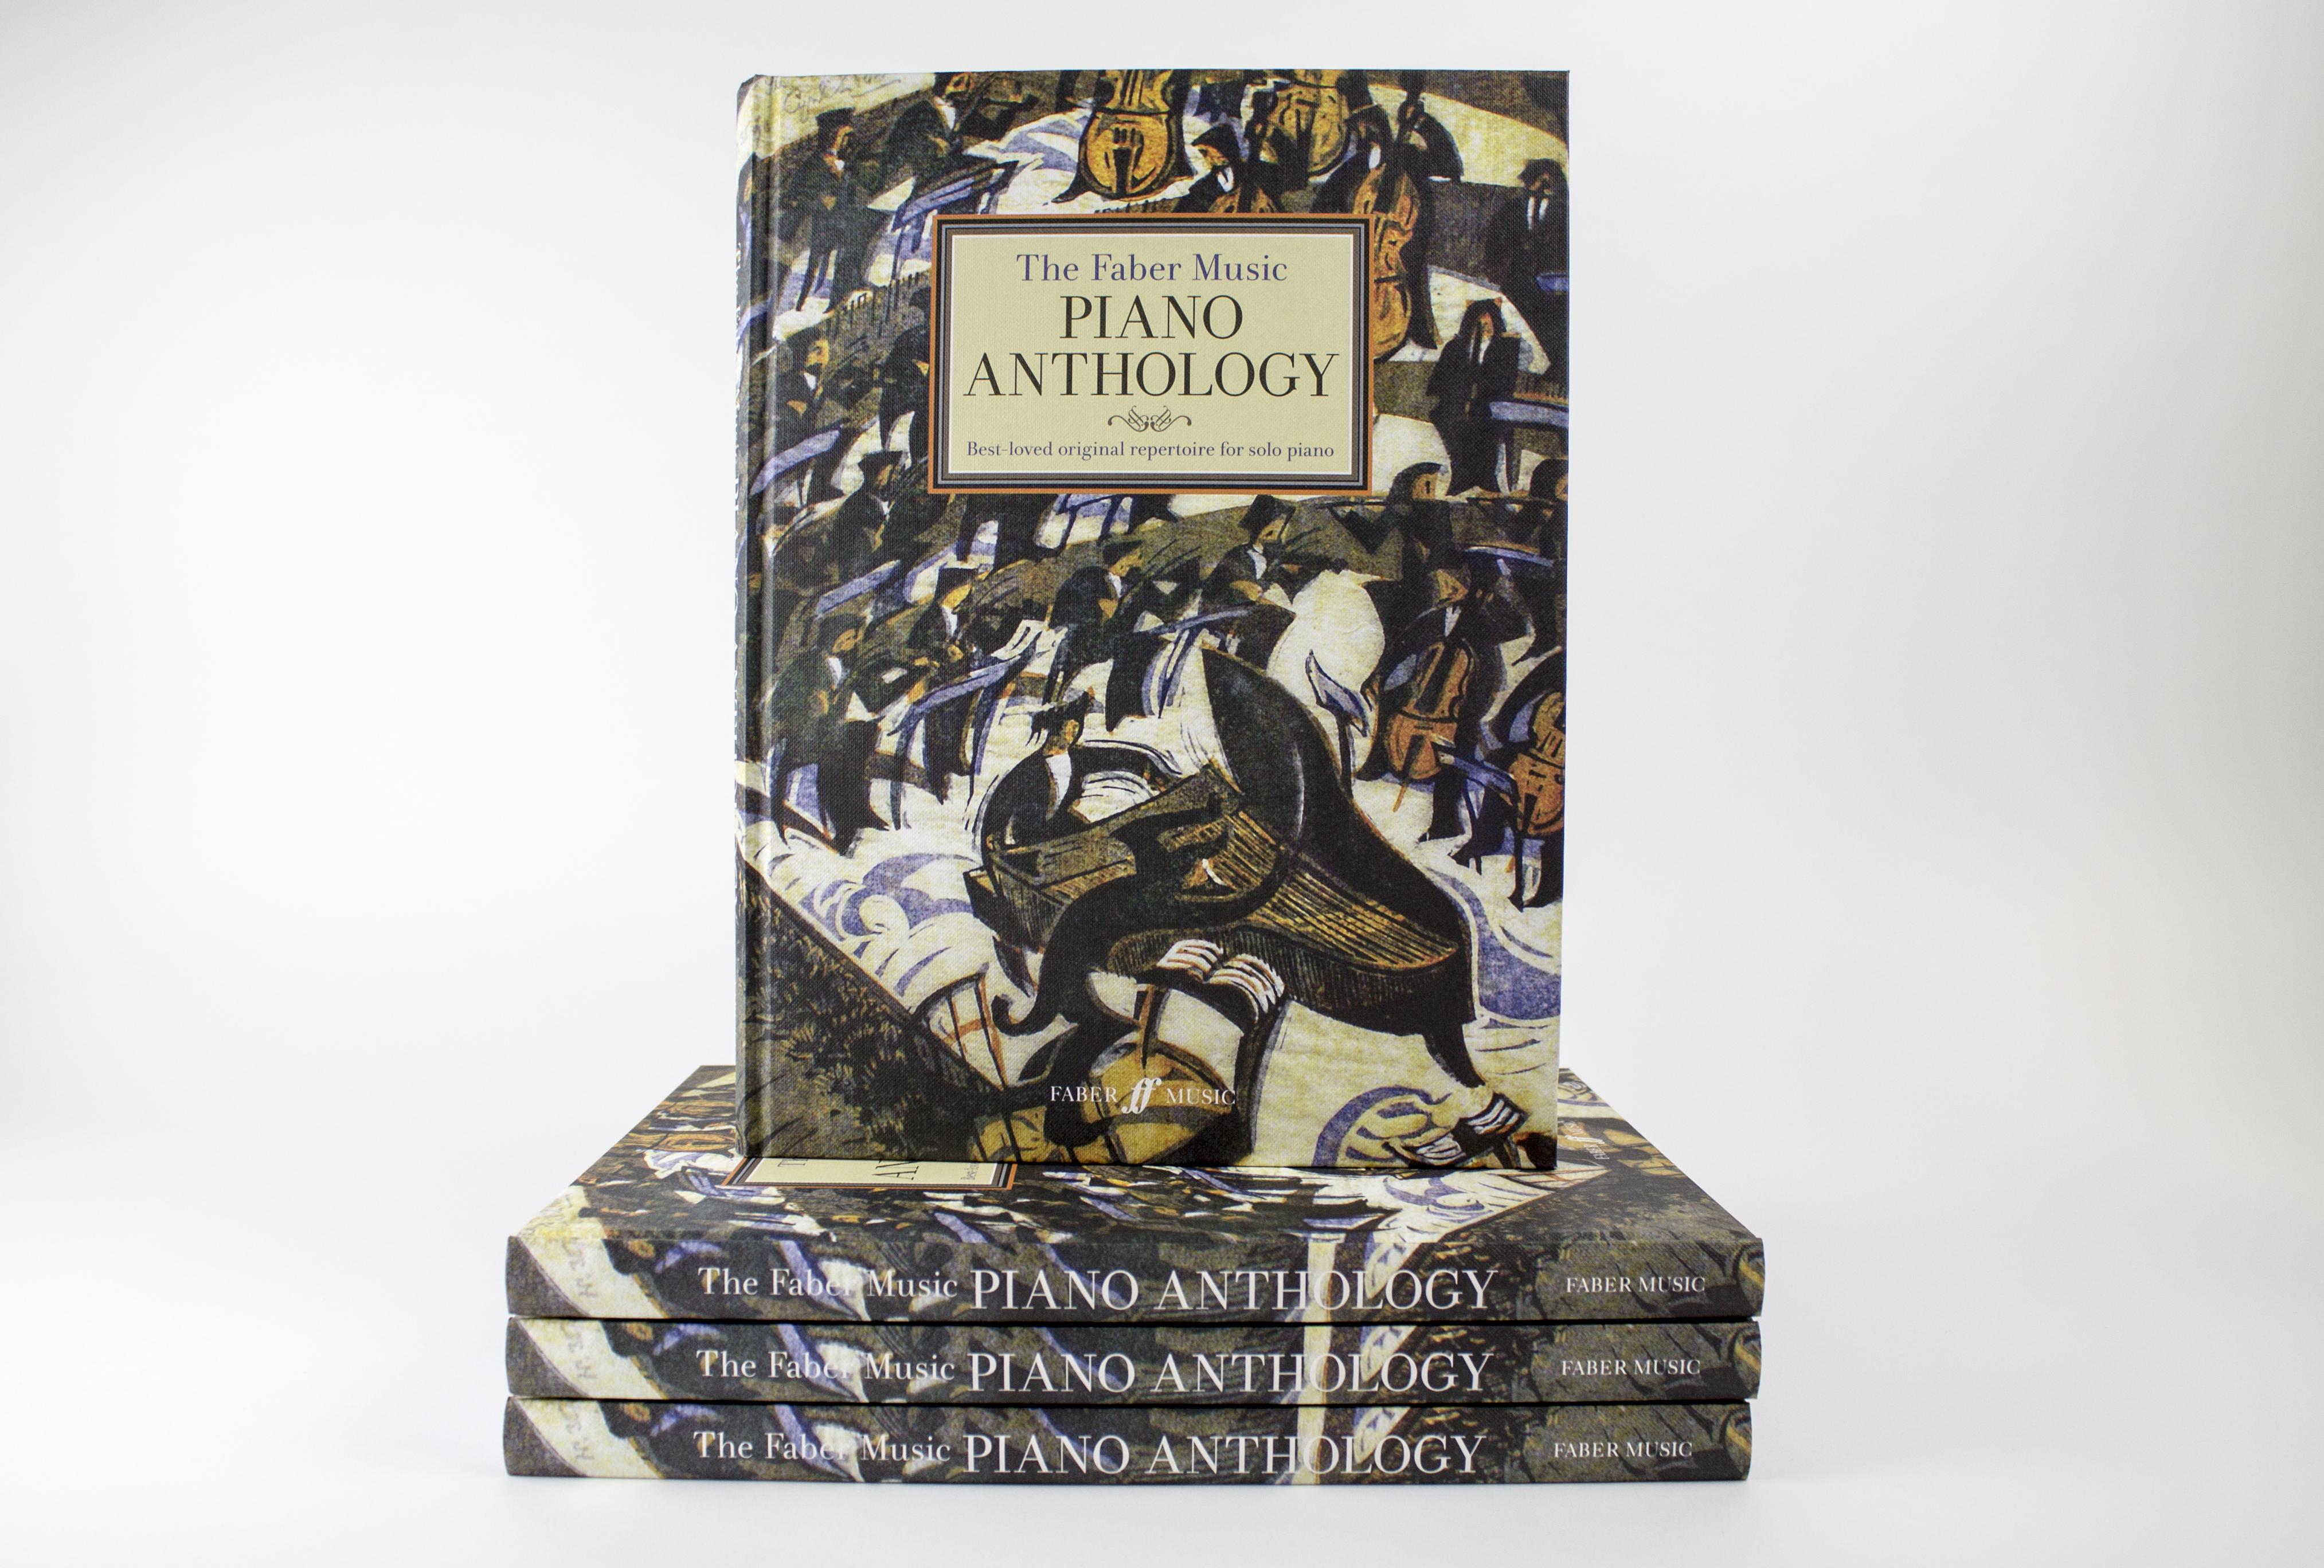 Piano music melanie spanswick the faber music piano anthology baditri Image collections